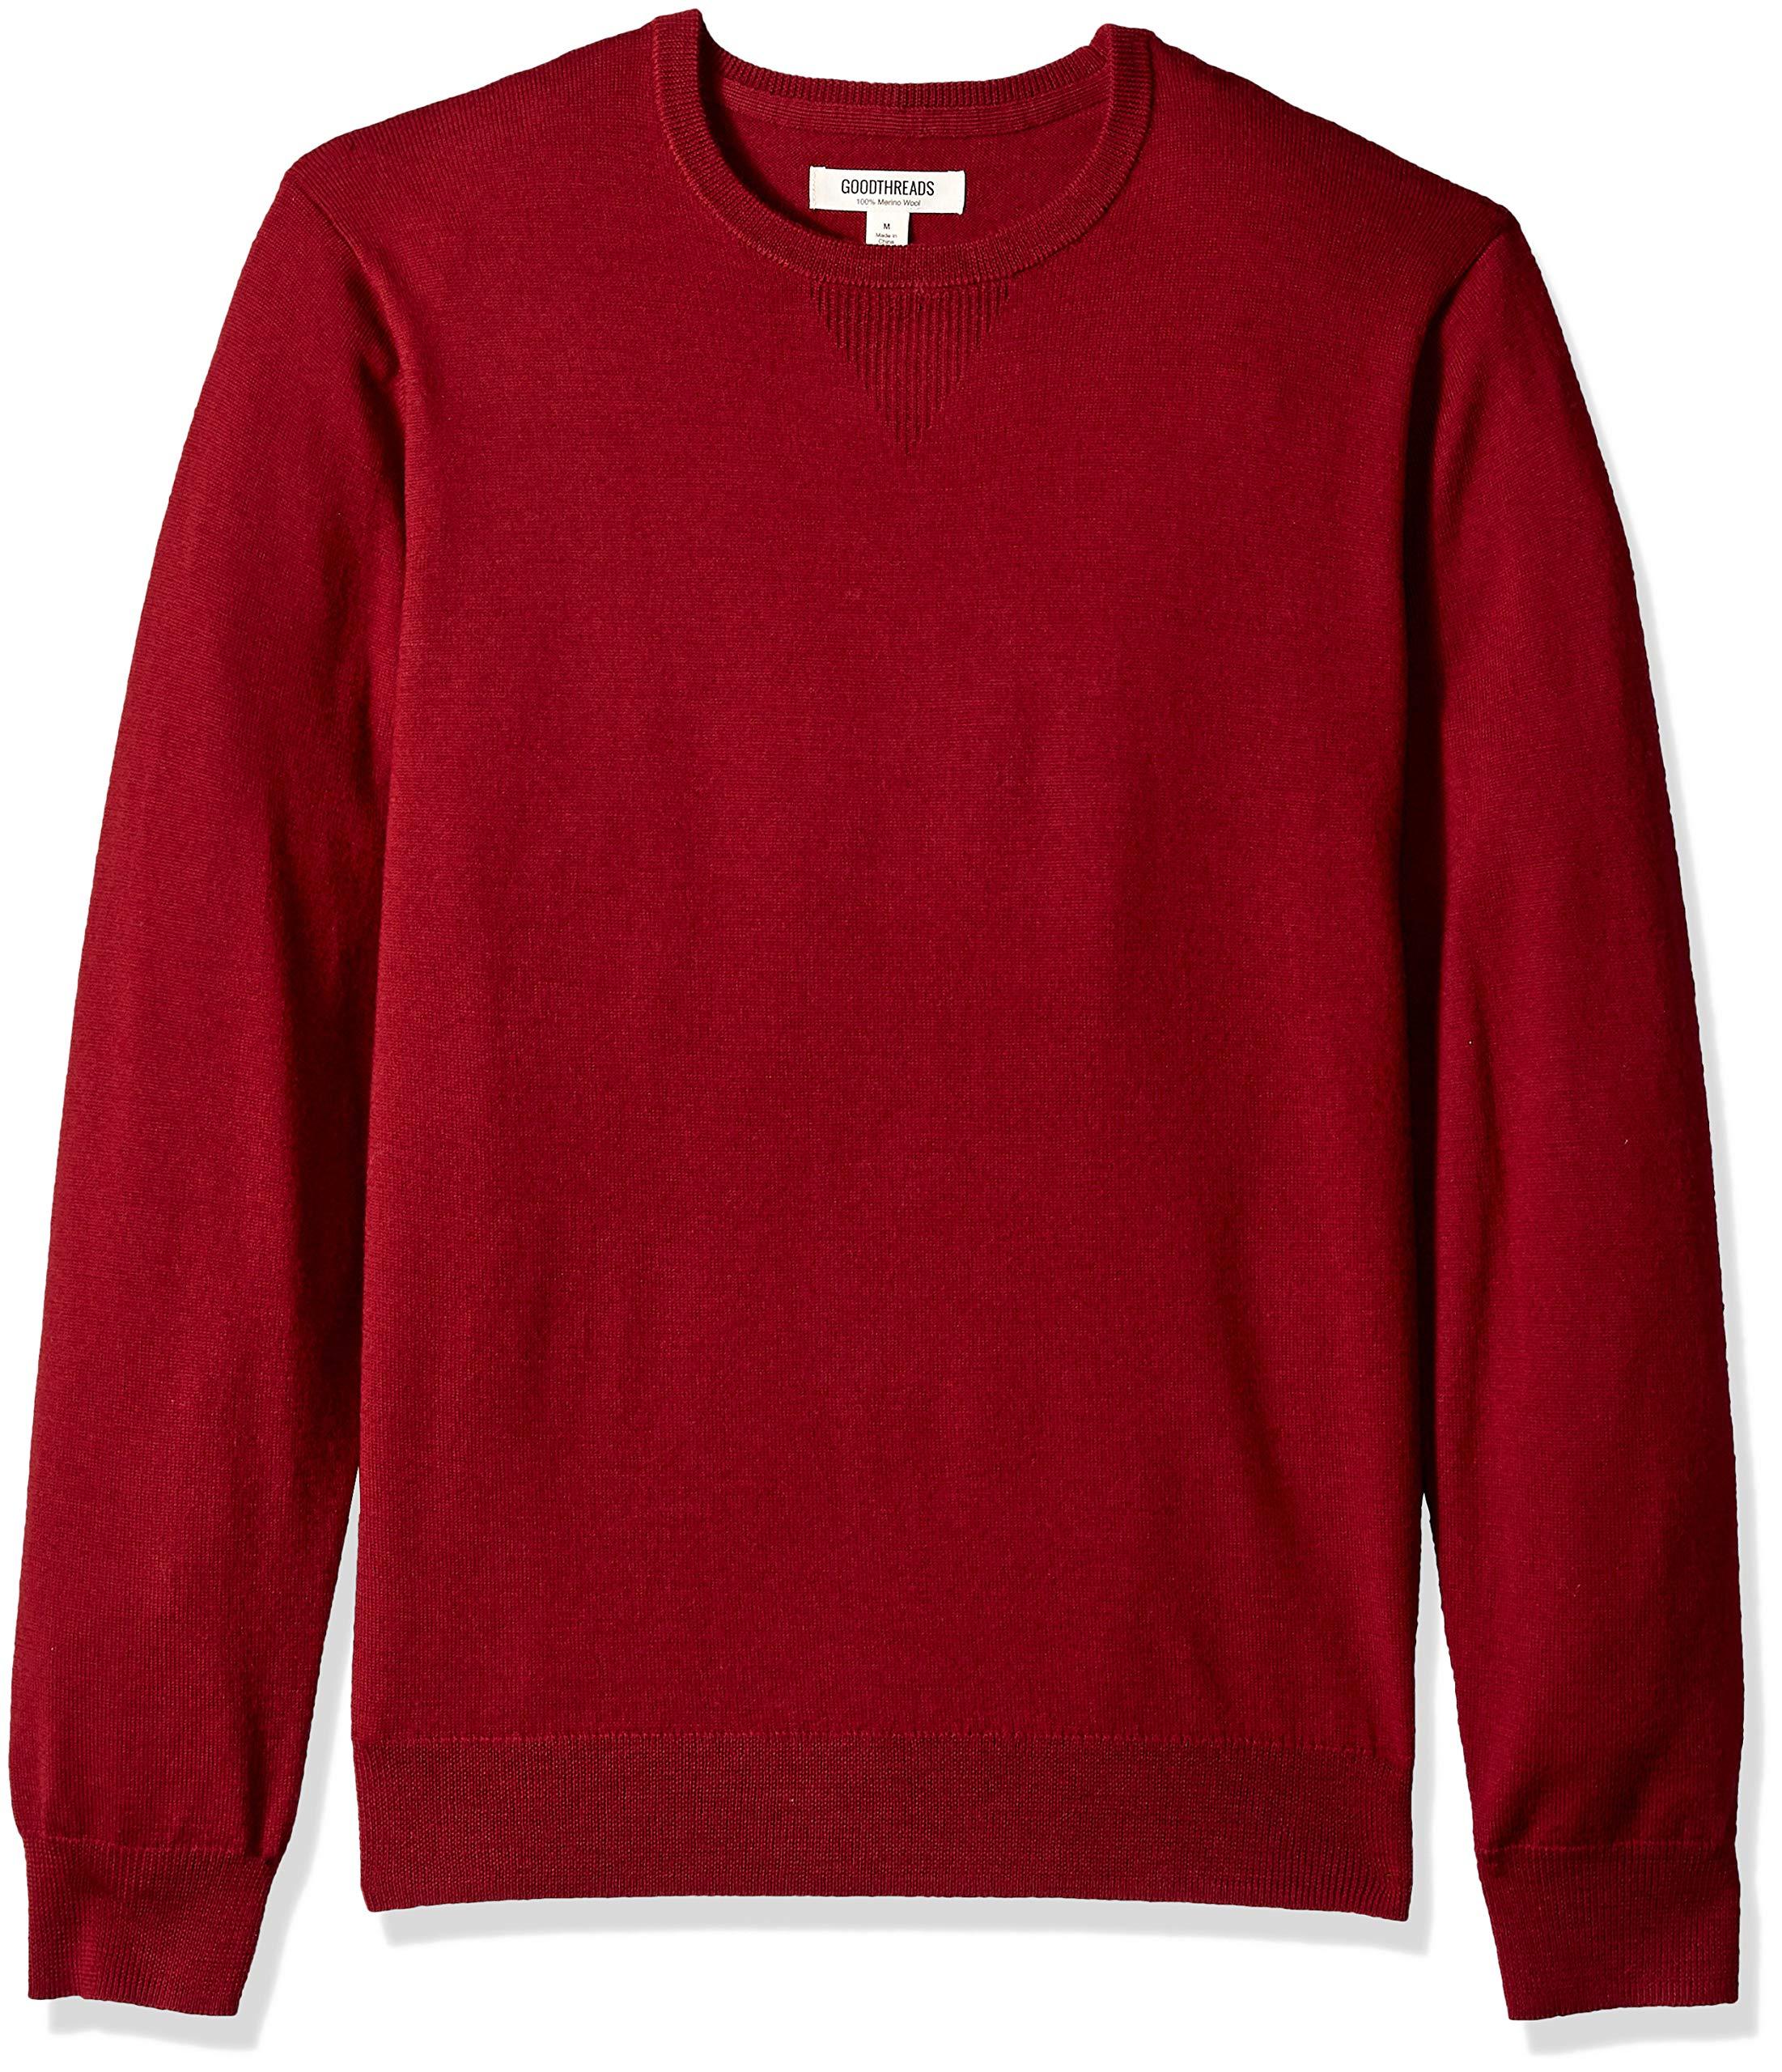 Goodthreads Men's Merino Wool Crewneck Sweater, red, X-Large